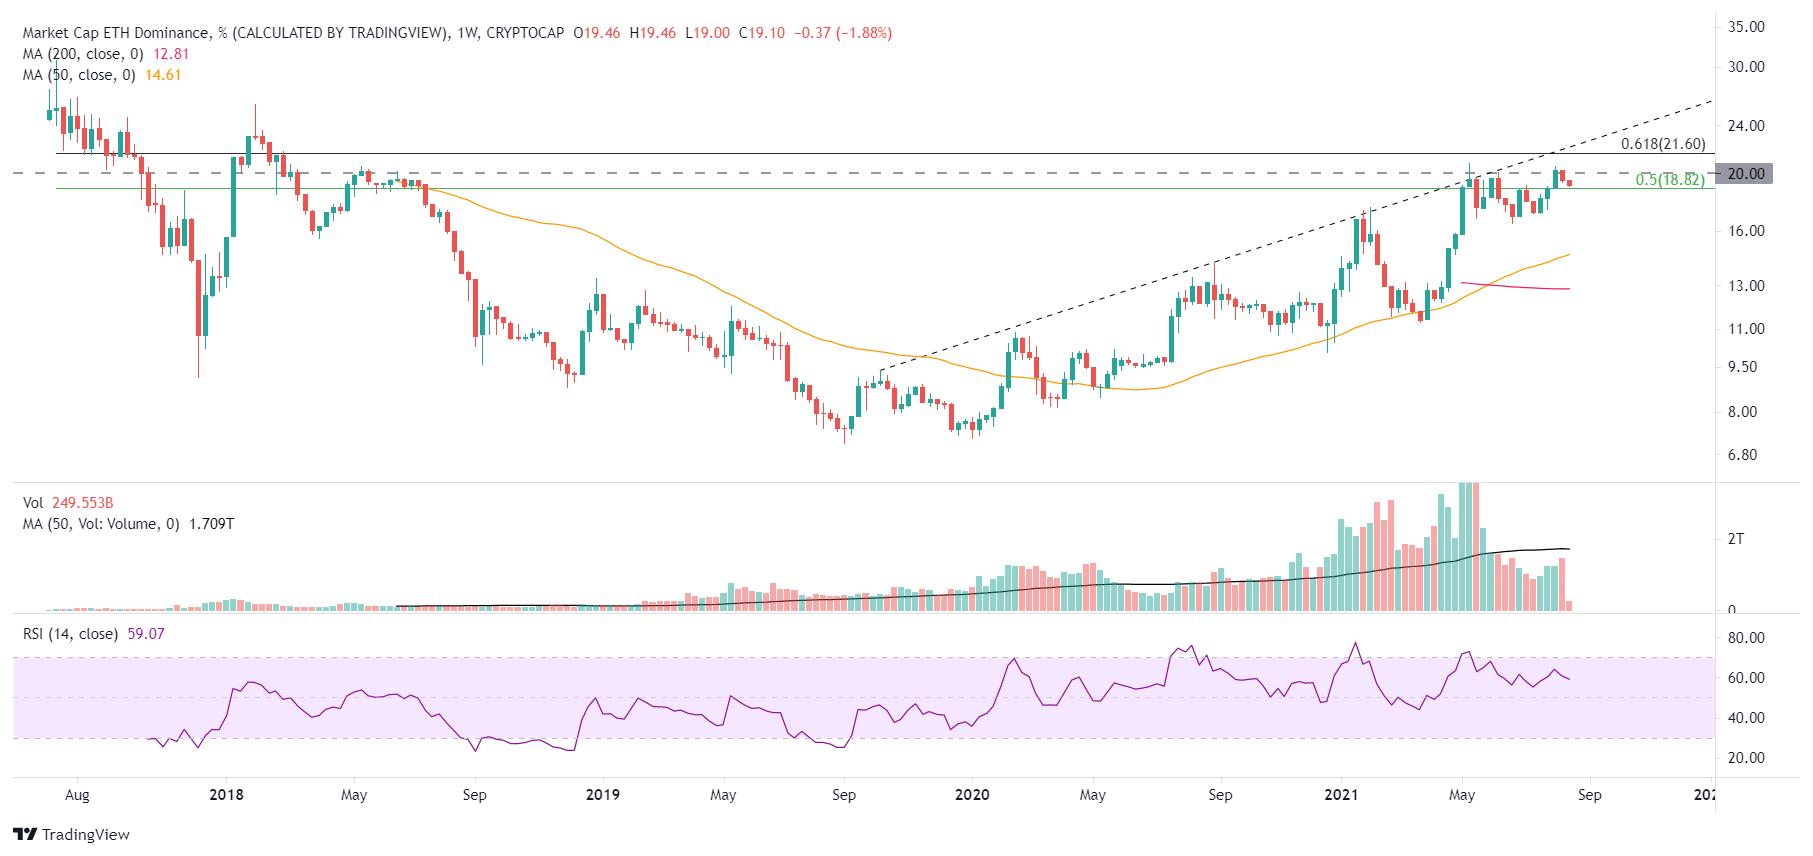 ETH/USD market dominance - weekly chart